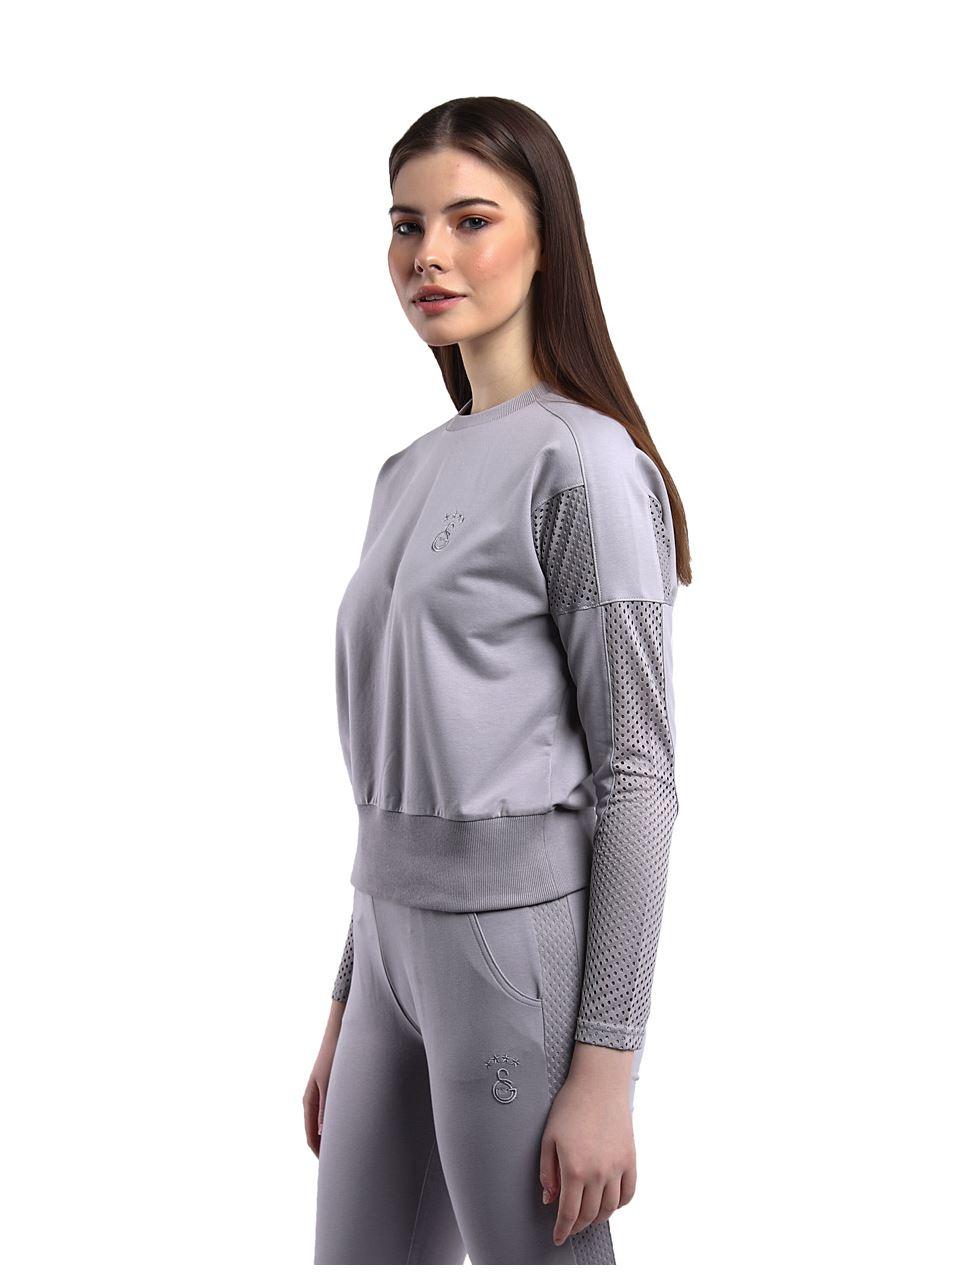 Galatasaray Kadın Sweatshirt K201185